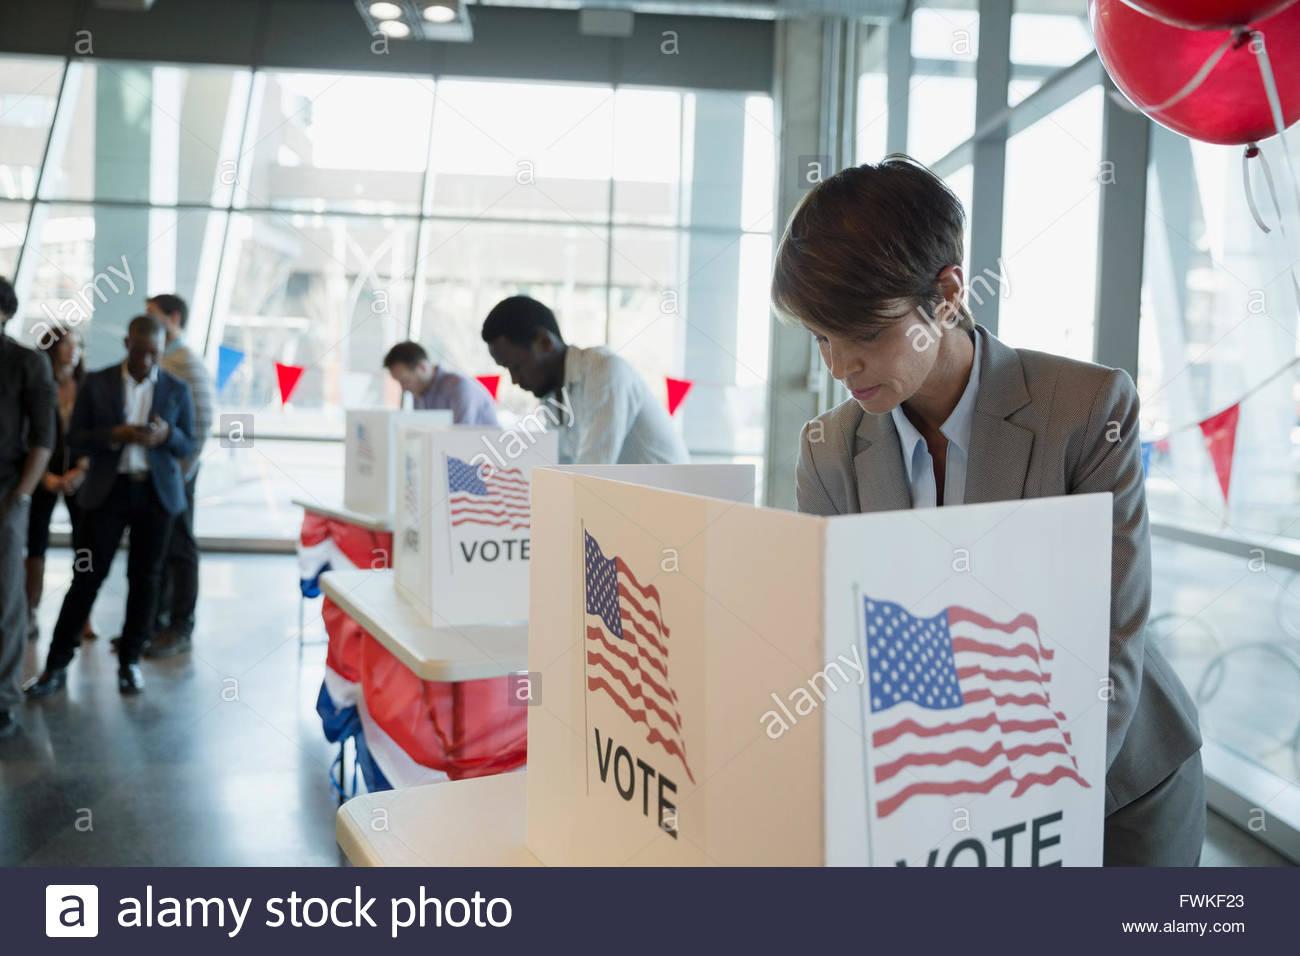 Frau bei der Abstimmung stand im Wahllokal Stockbild